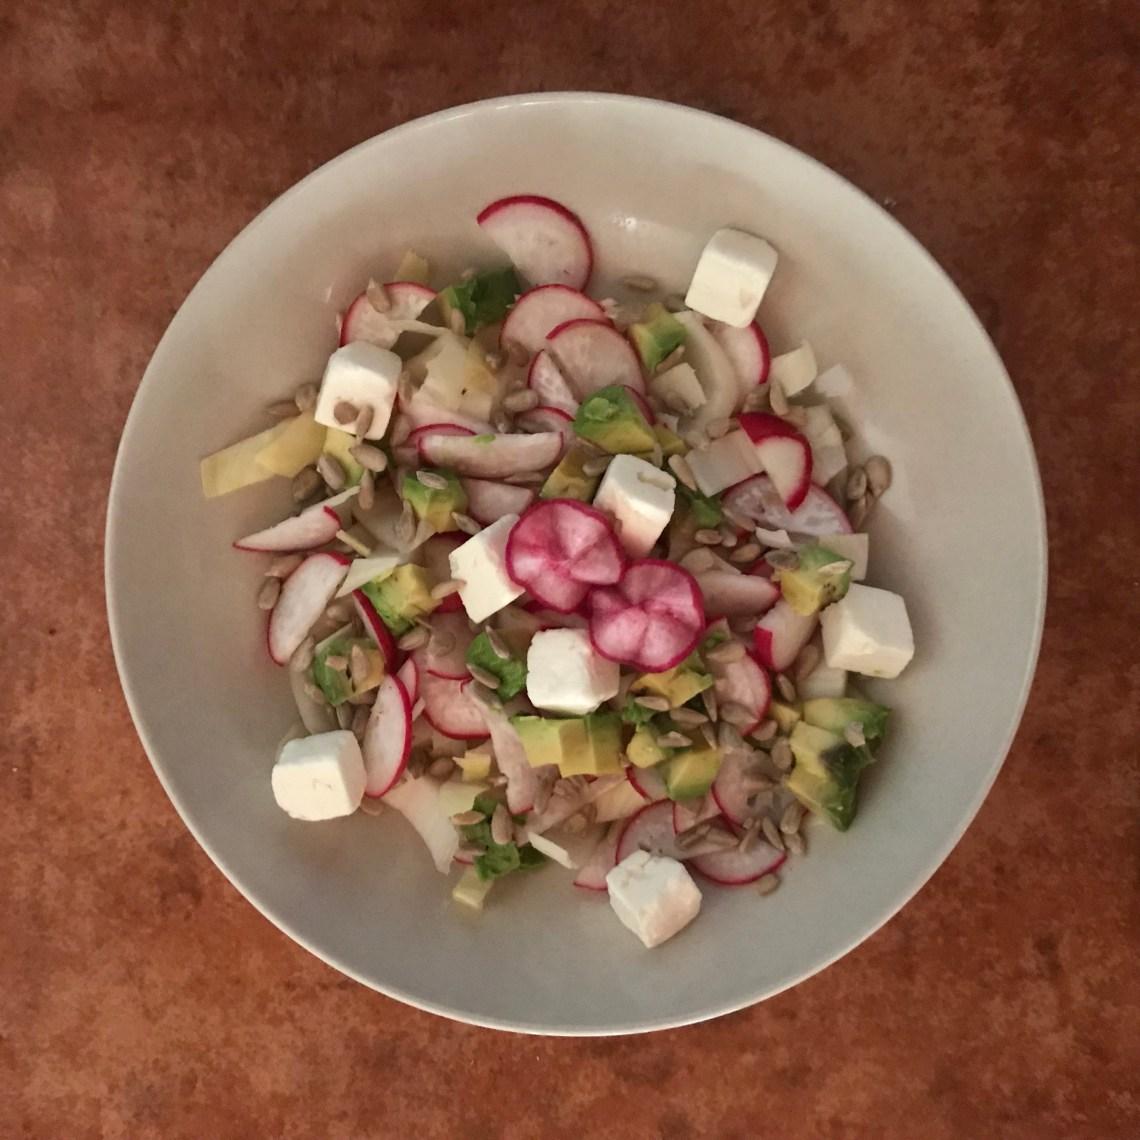 gluten-free salad in a bowl